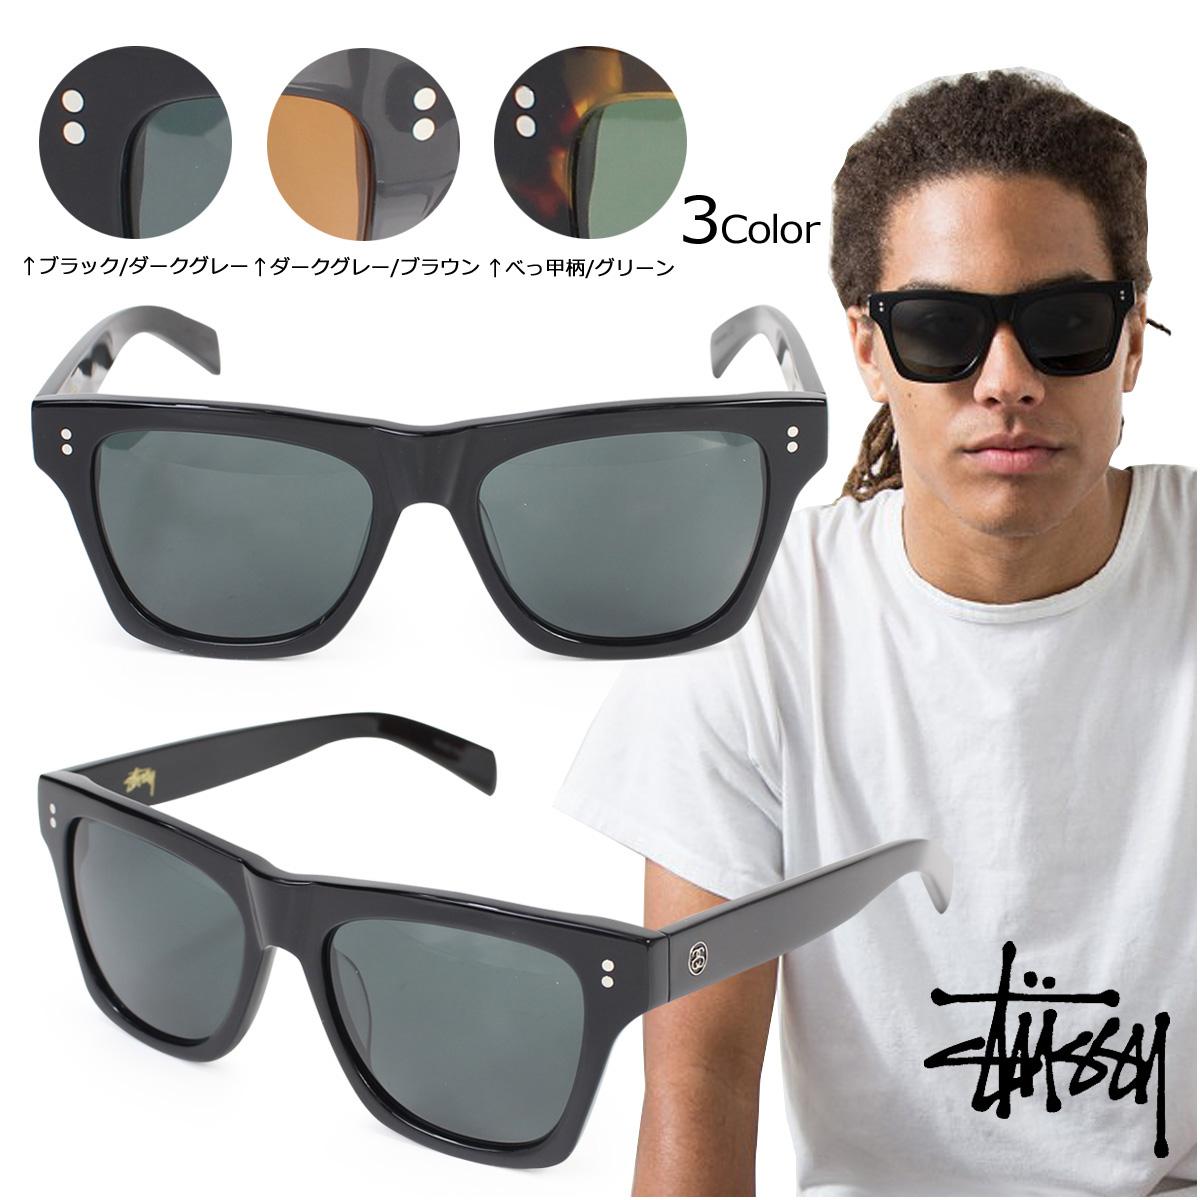 a62177380d ステューシー STUSSY sunglasses men gap Dis UV cut Norton NORTON SUNGLASS eyewear  EYEWEAR 3 color  7 12 Shinnyu load